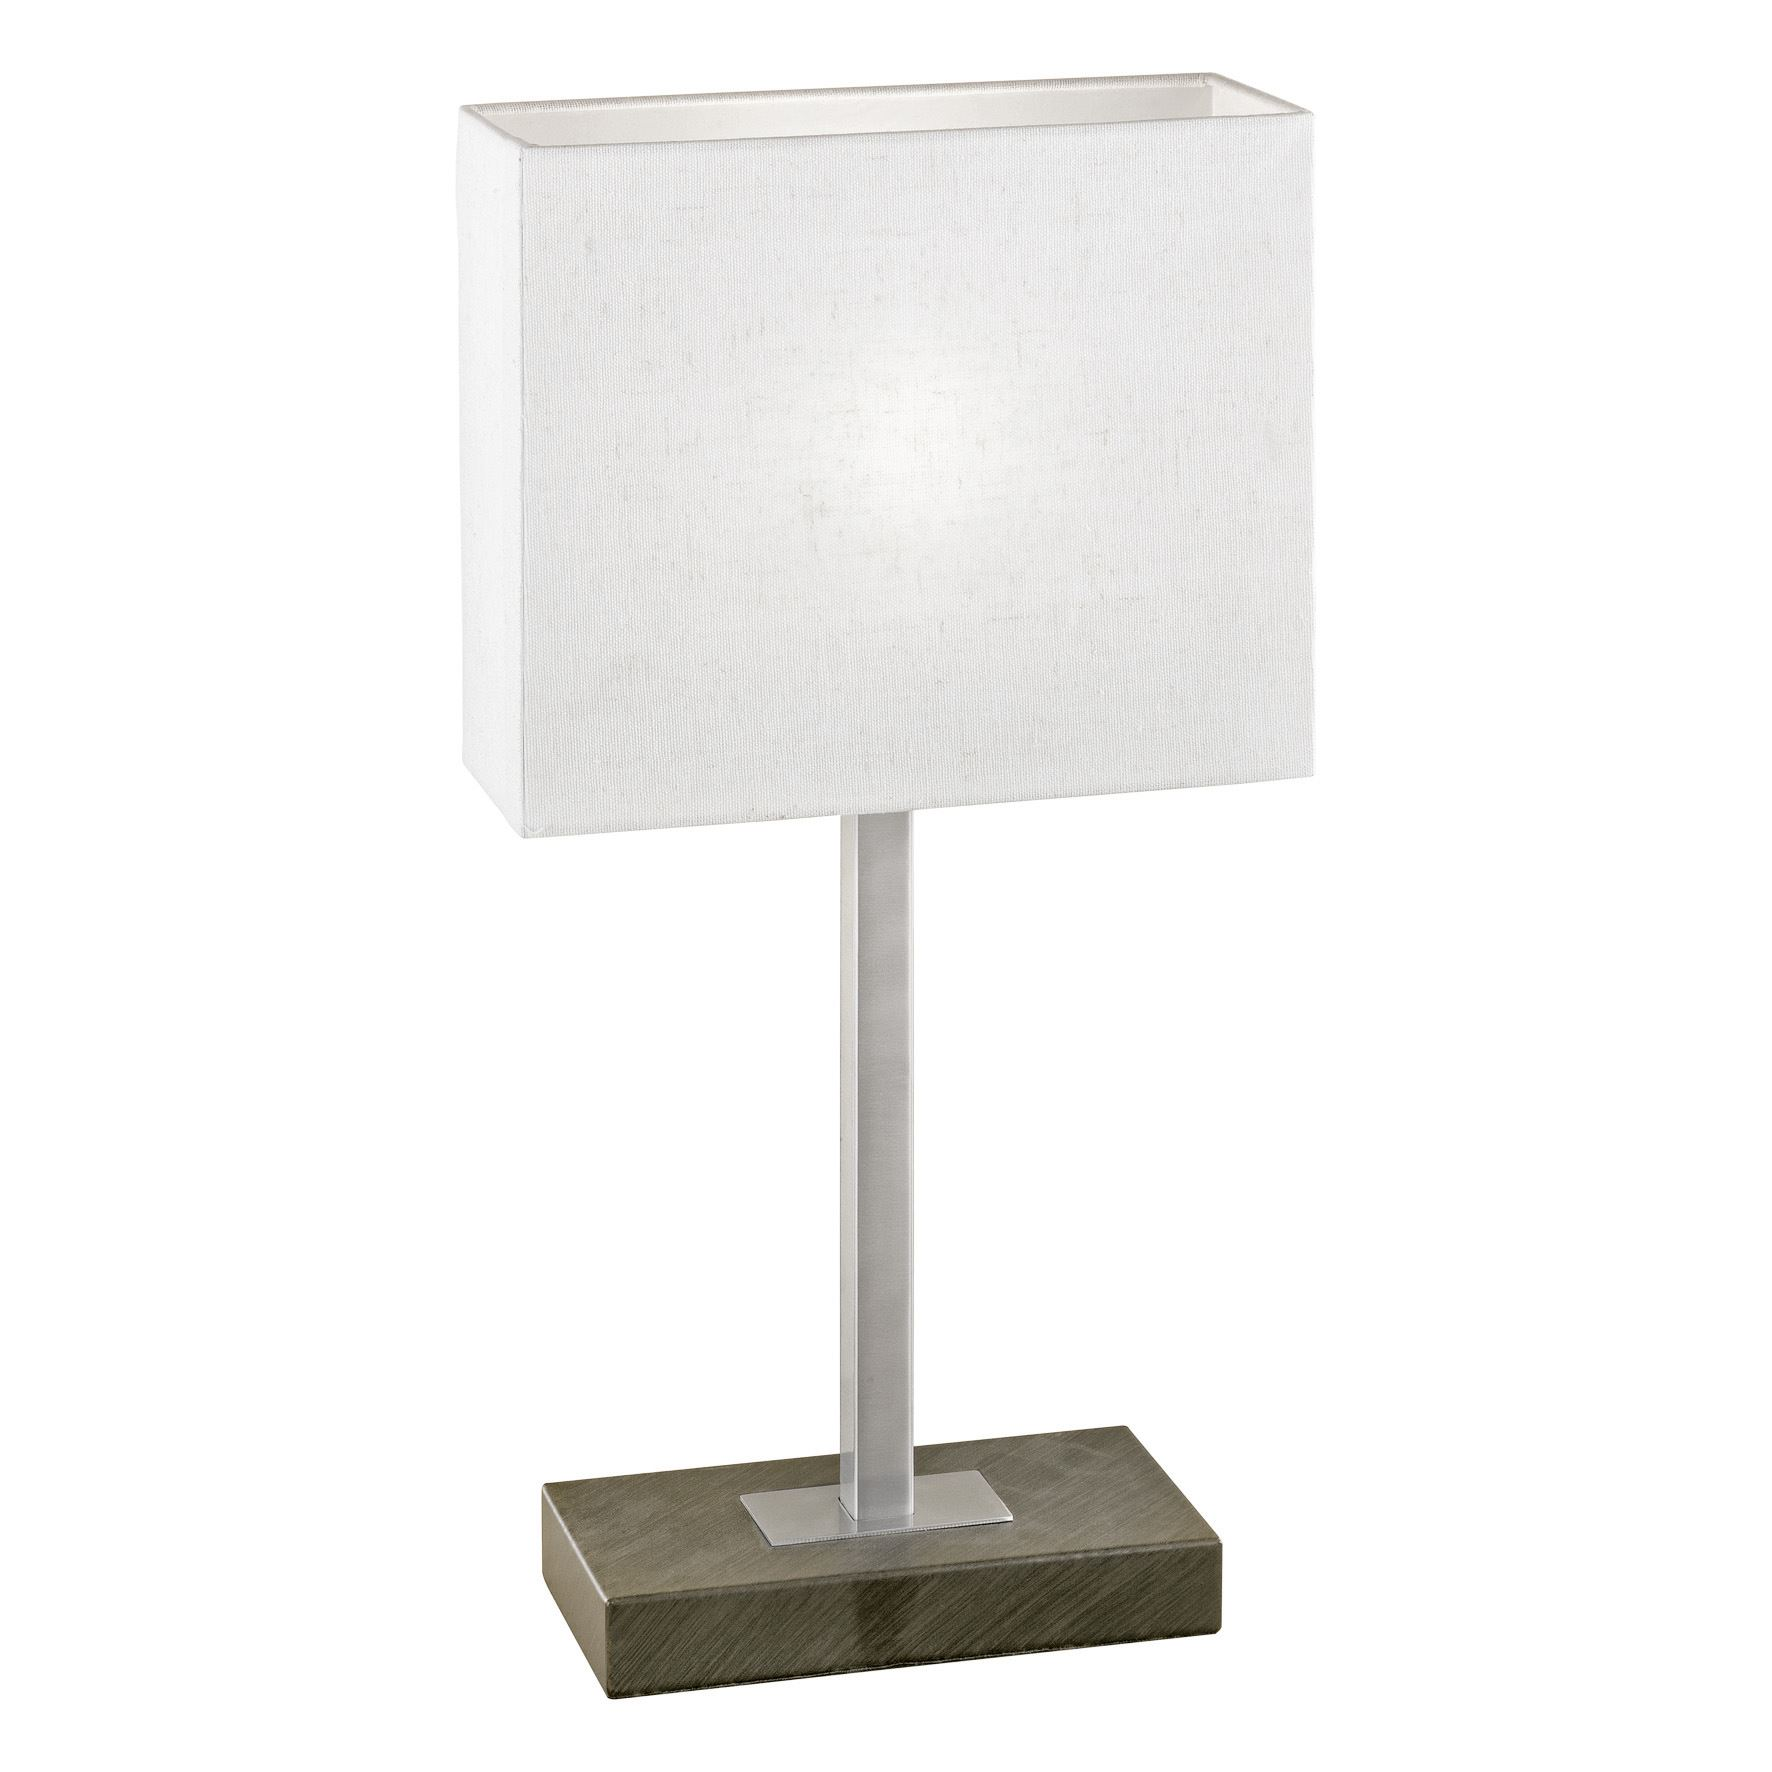 Pueblo Table Lamp 1 Light With Touchdimmer Antique Brown Beige